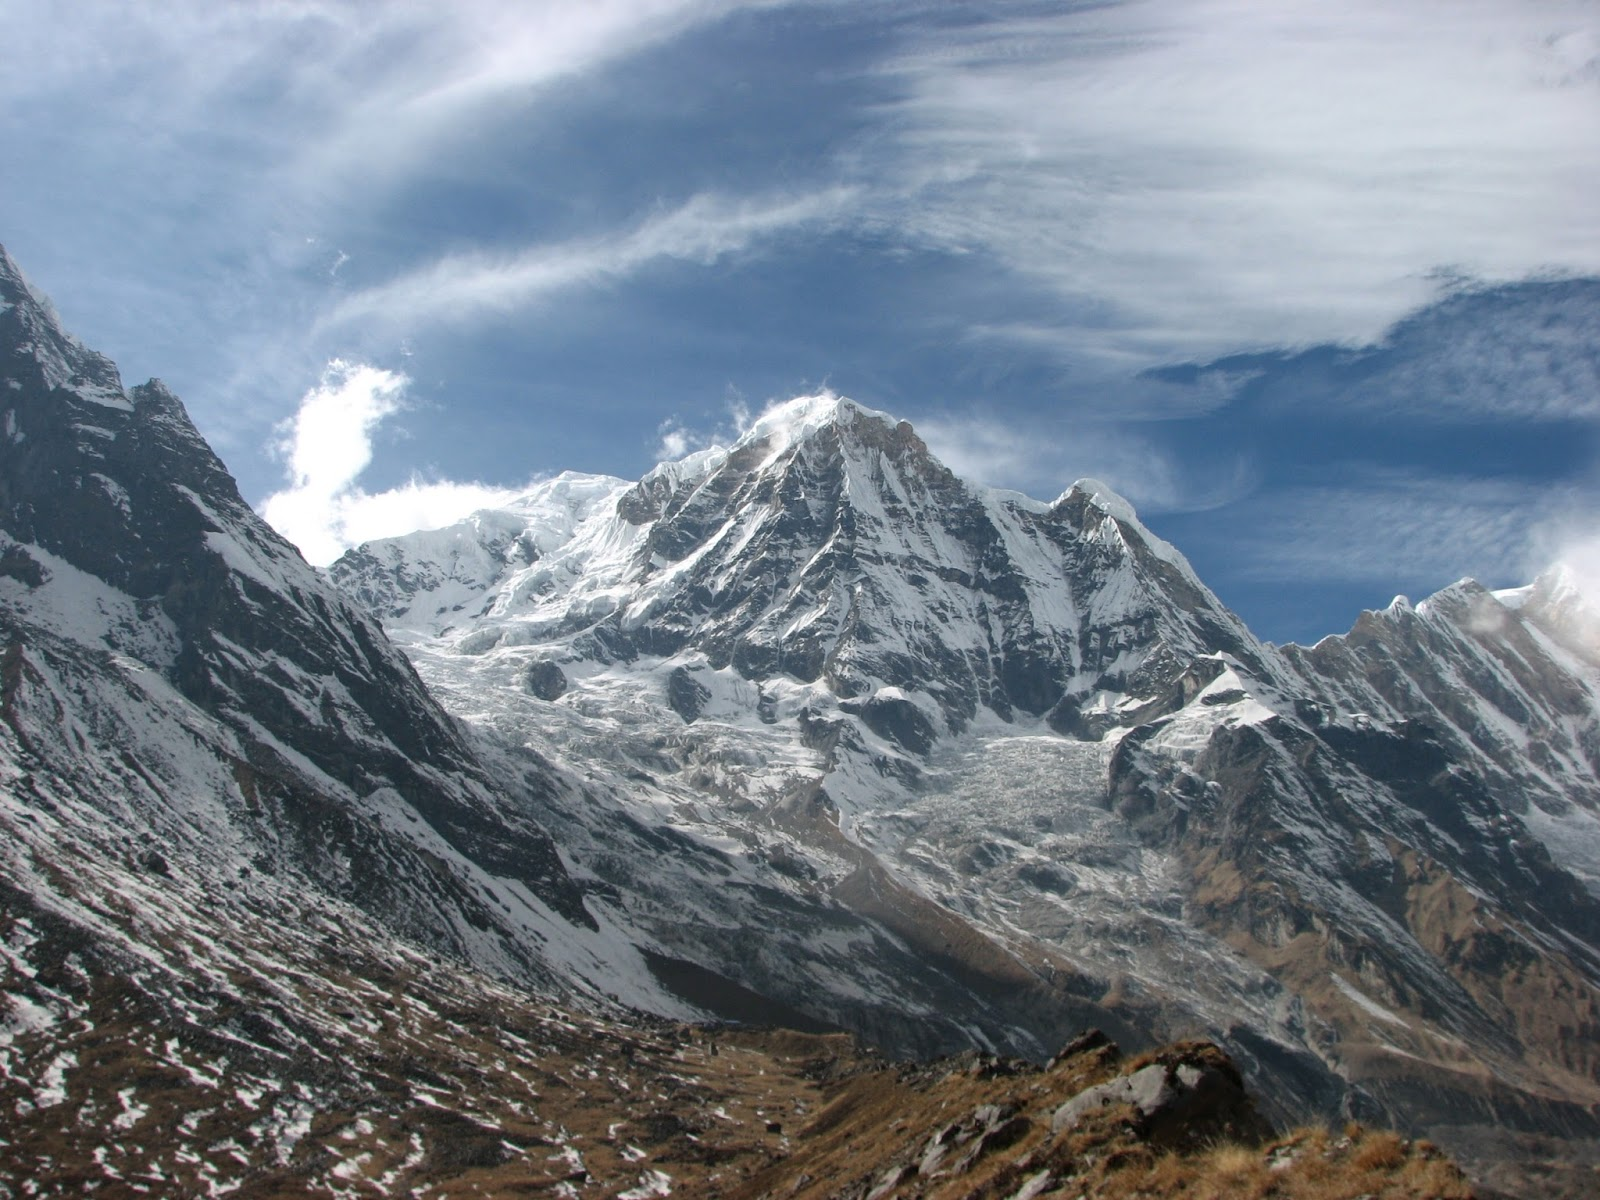 Himalaya Mountains HD Wallpapers HD Wallpapers 360 1600x1200